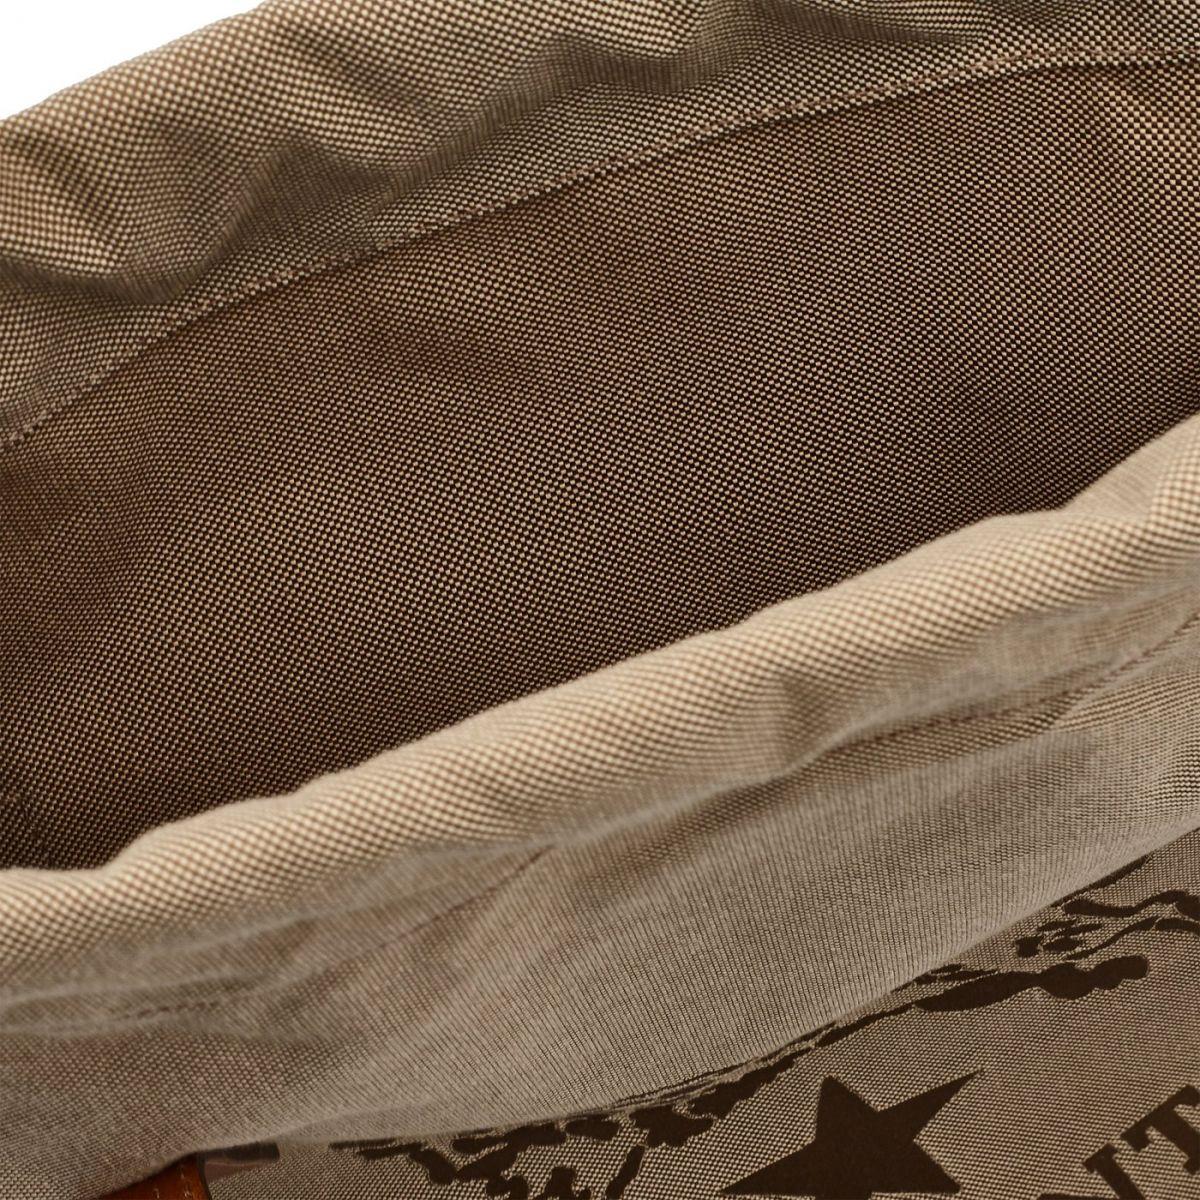 Men's Tote Bag  in Jaquard BTO086 color Khaki/Chocolate | Details